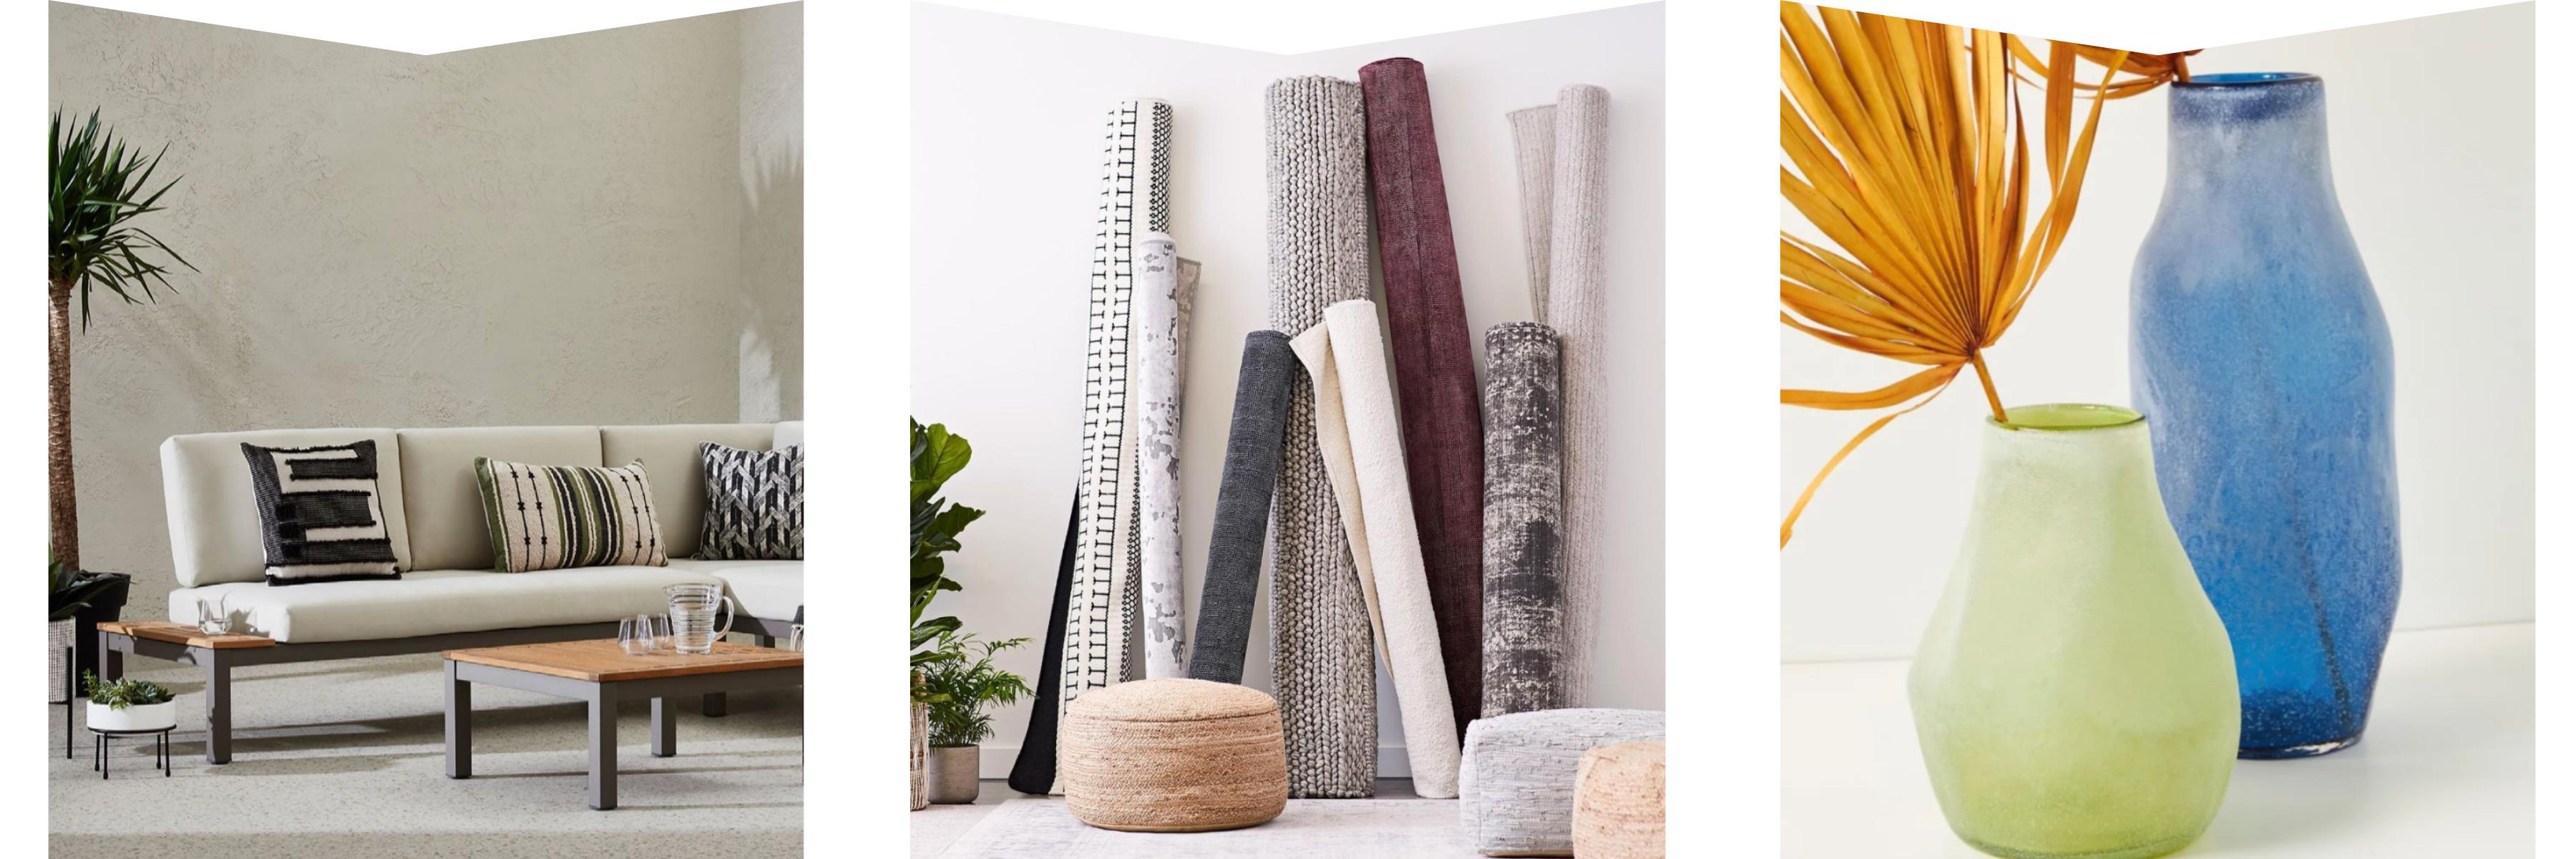 Pillows, carpets & vases from Hudson's Bay